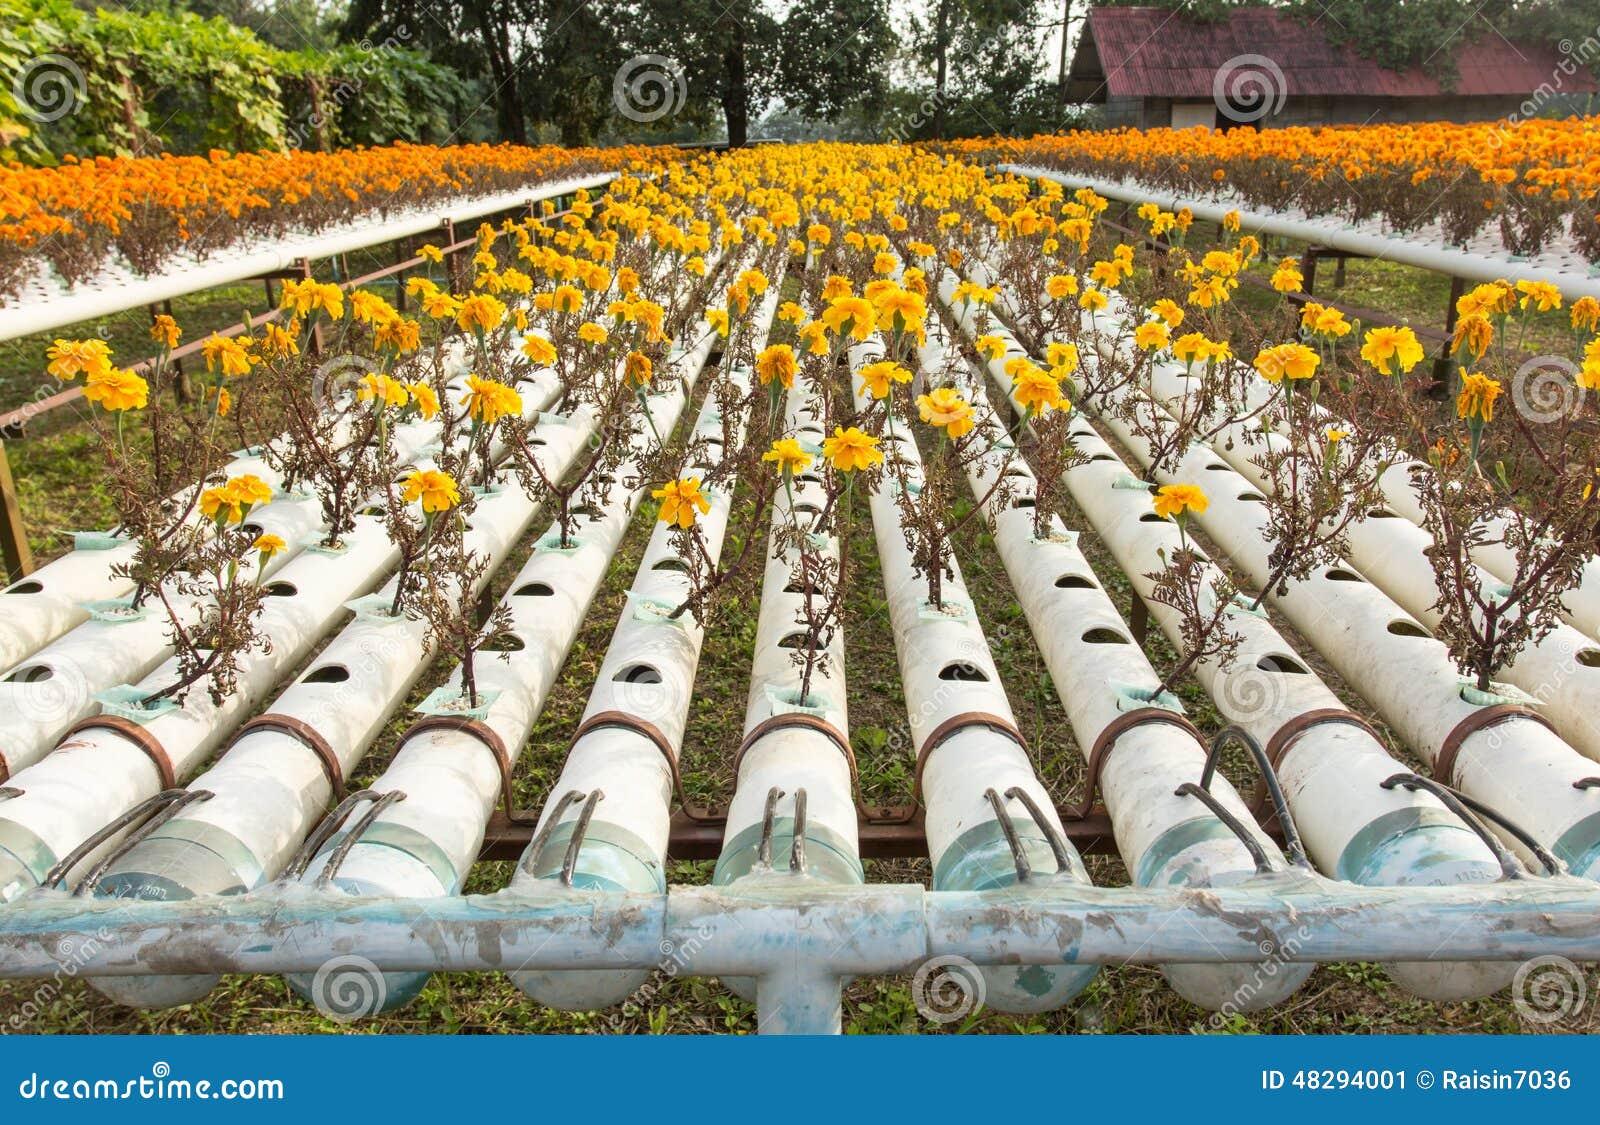 Hydroponic cut flower business plan